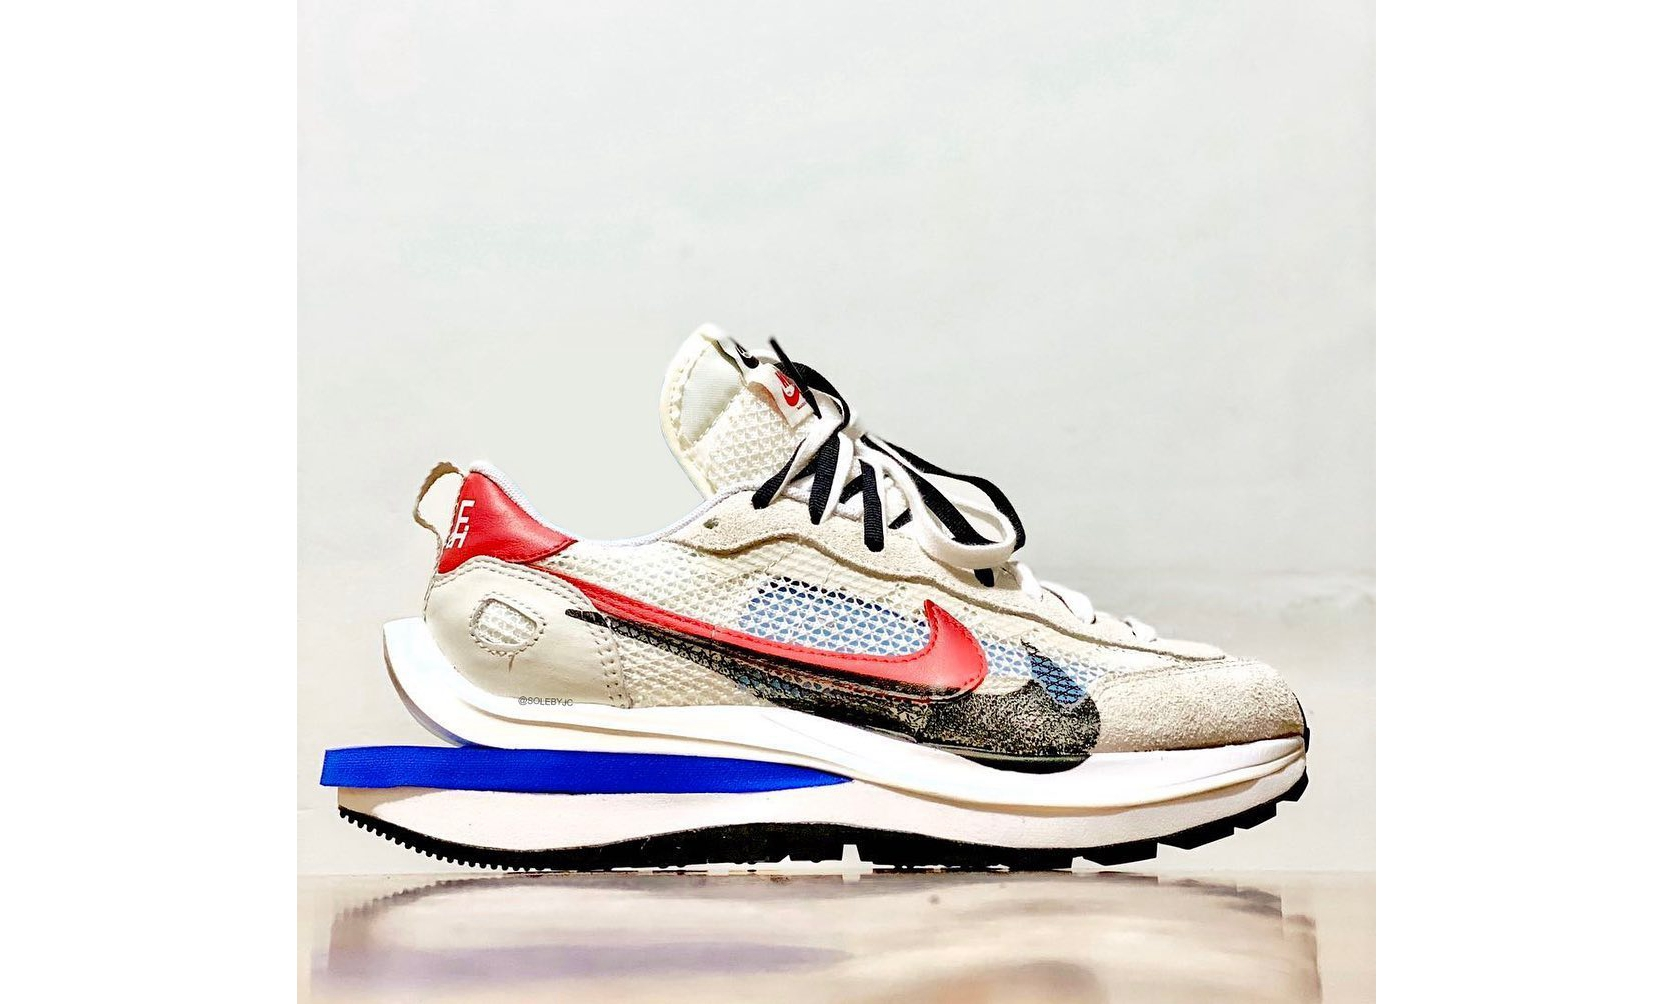 sacai x Nike Vaporwaffle 全新配色实物公开